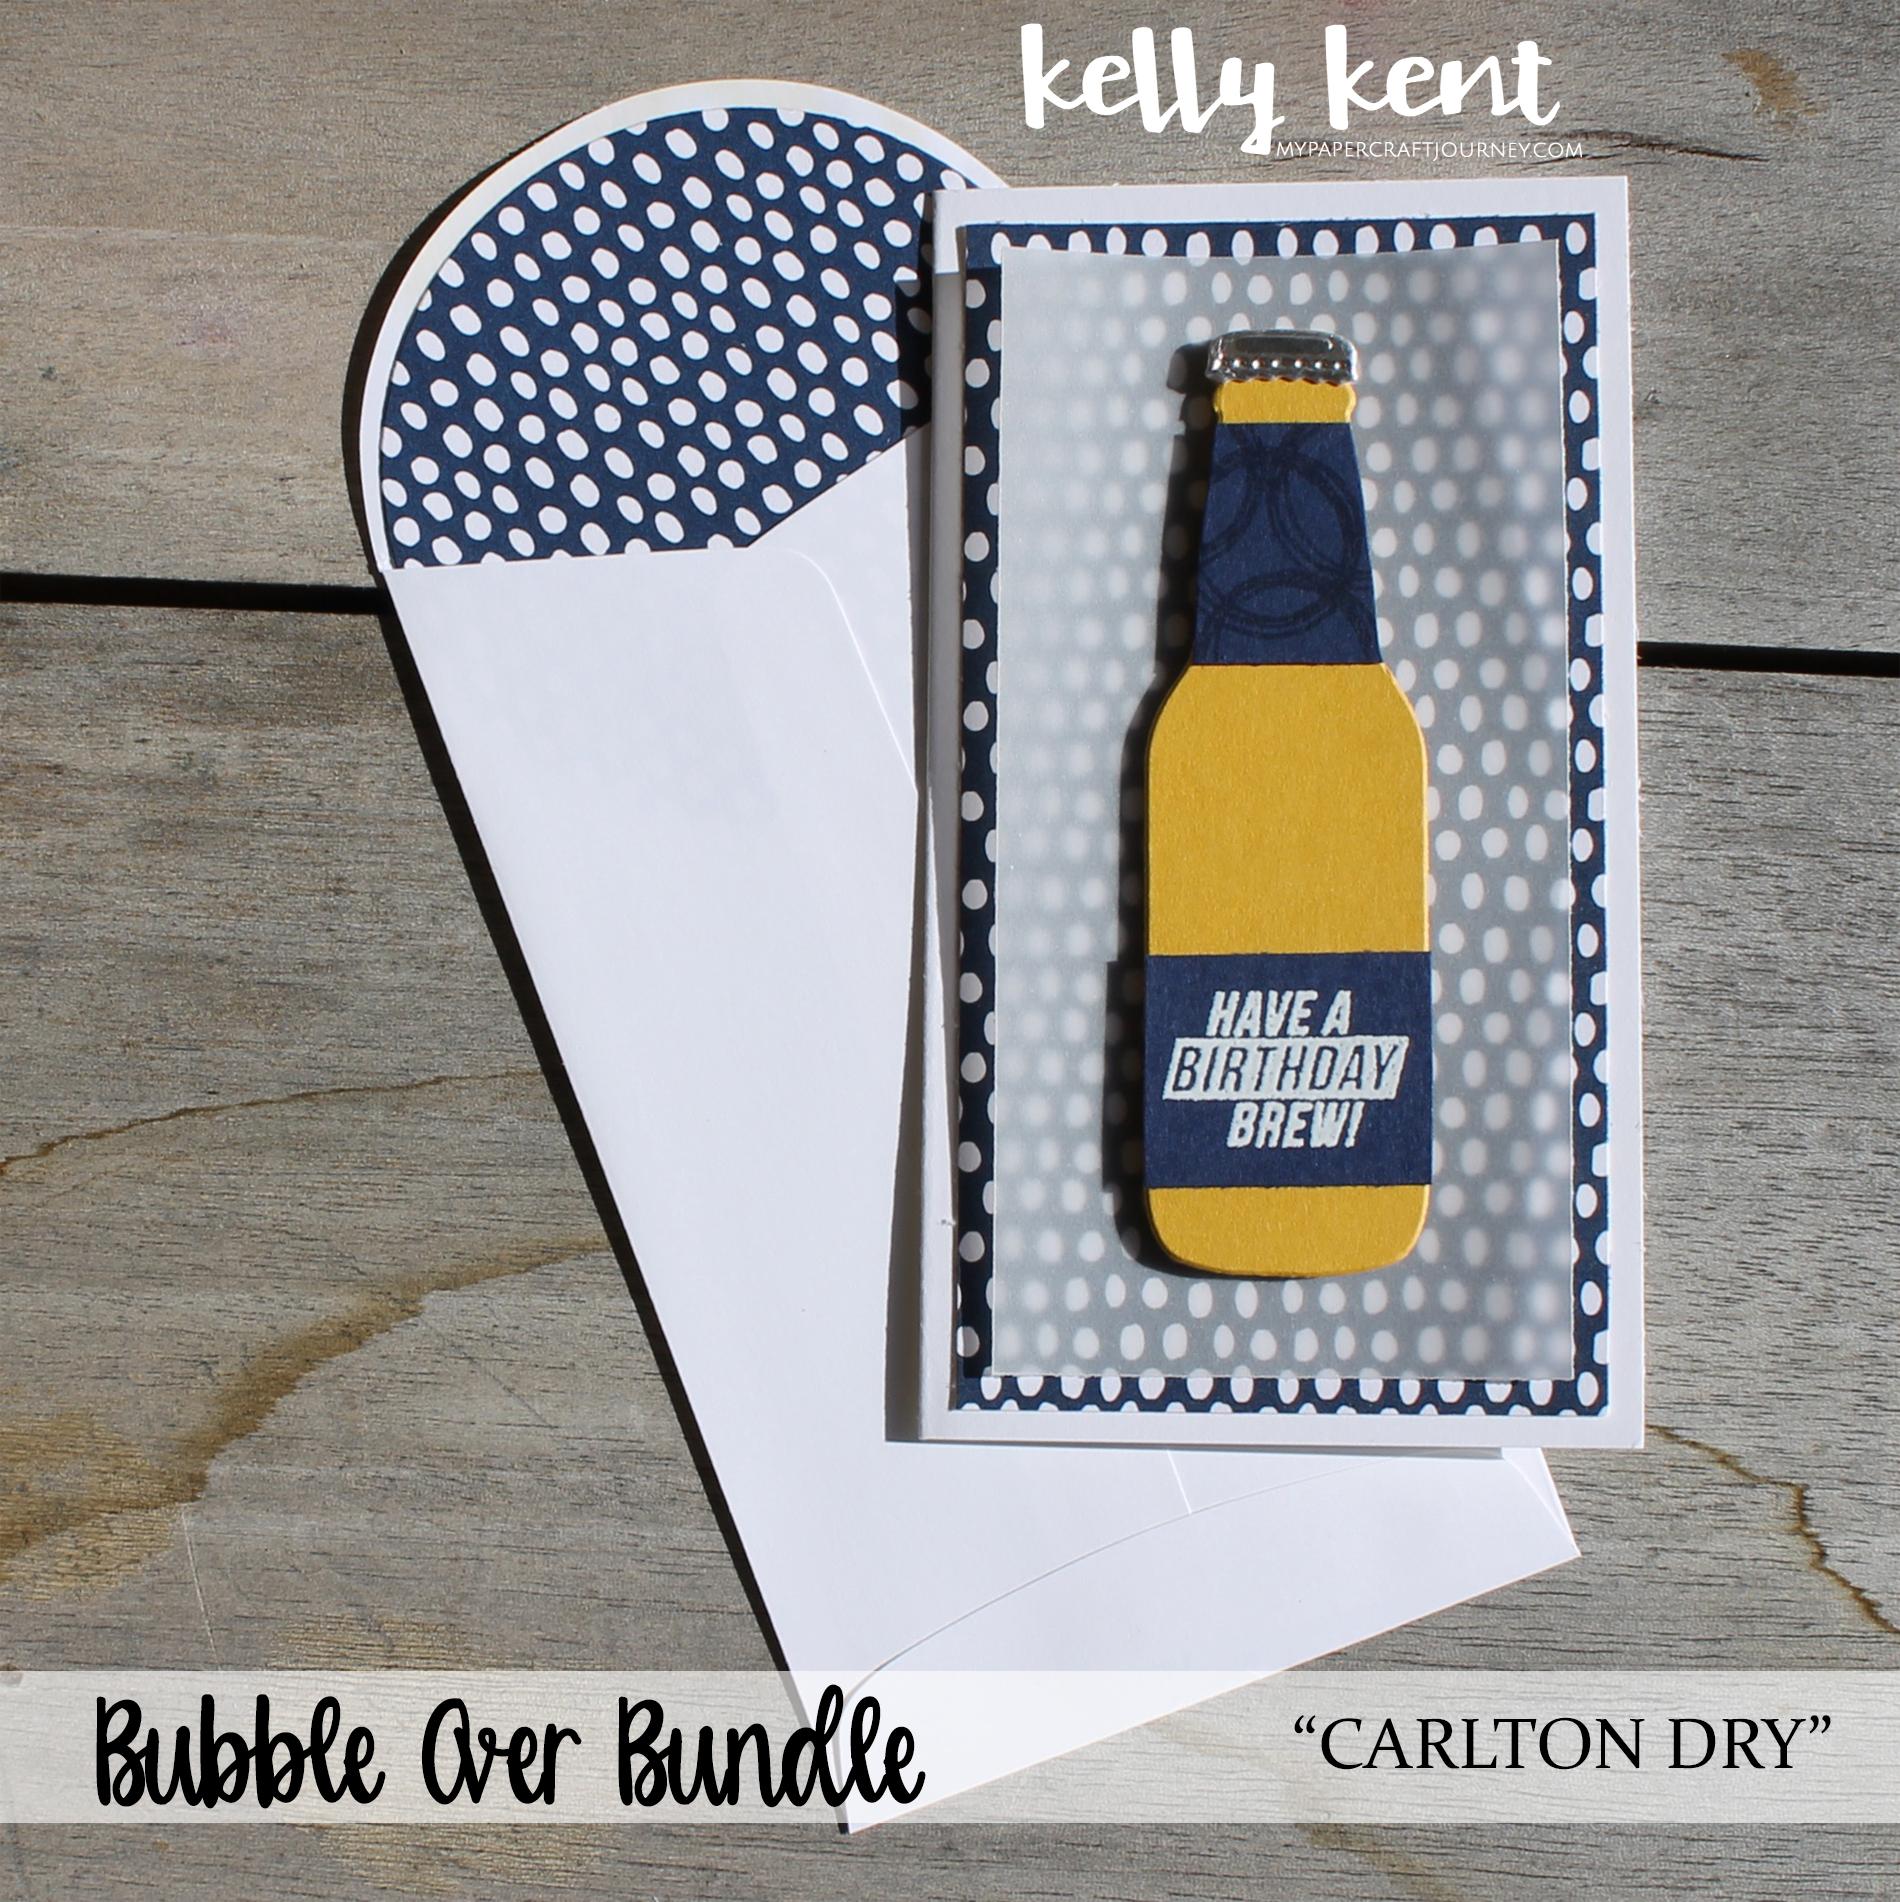 Bubble Over - Carlton Dry | kelly kent